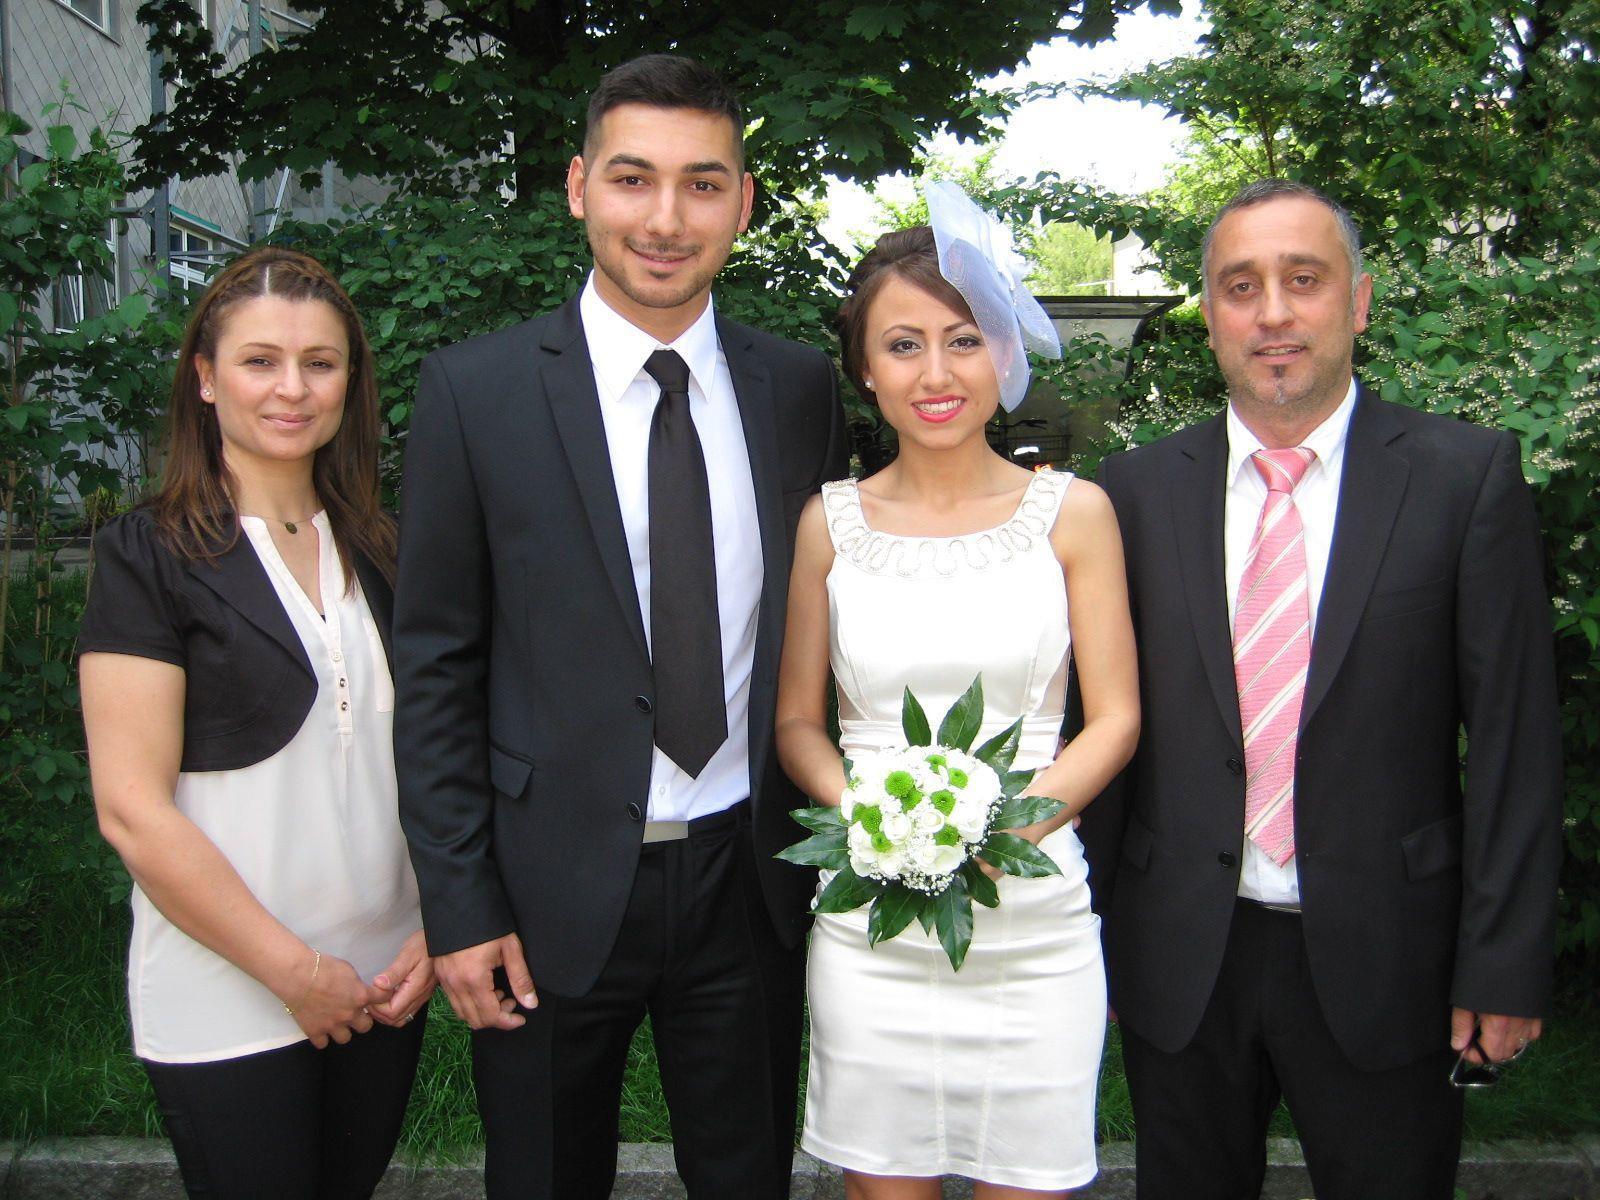 Rabiye Demircan und Yavuz Güllü haben geheiratet.